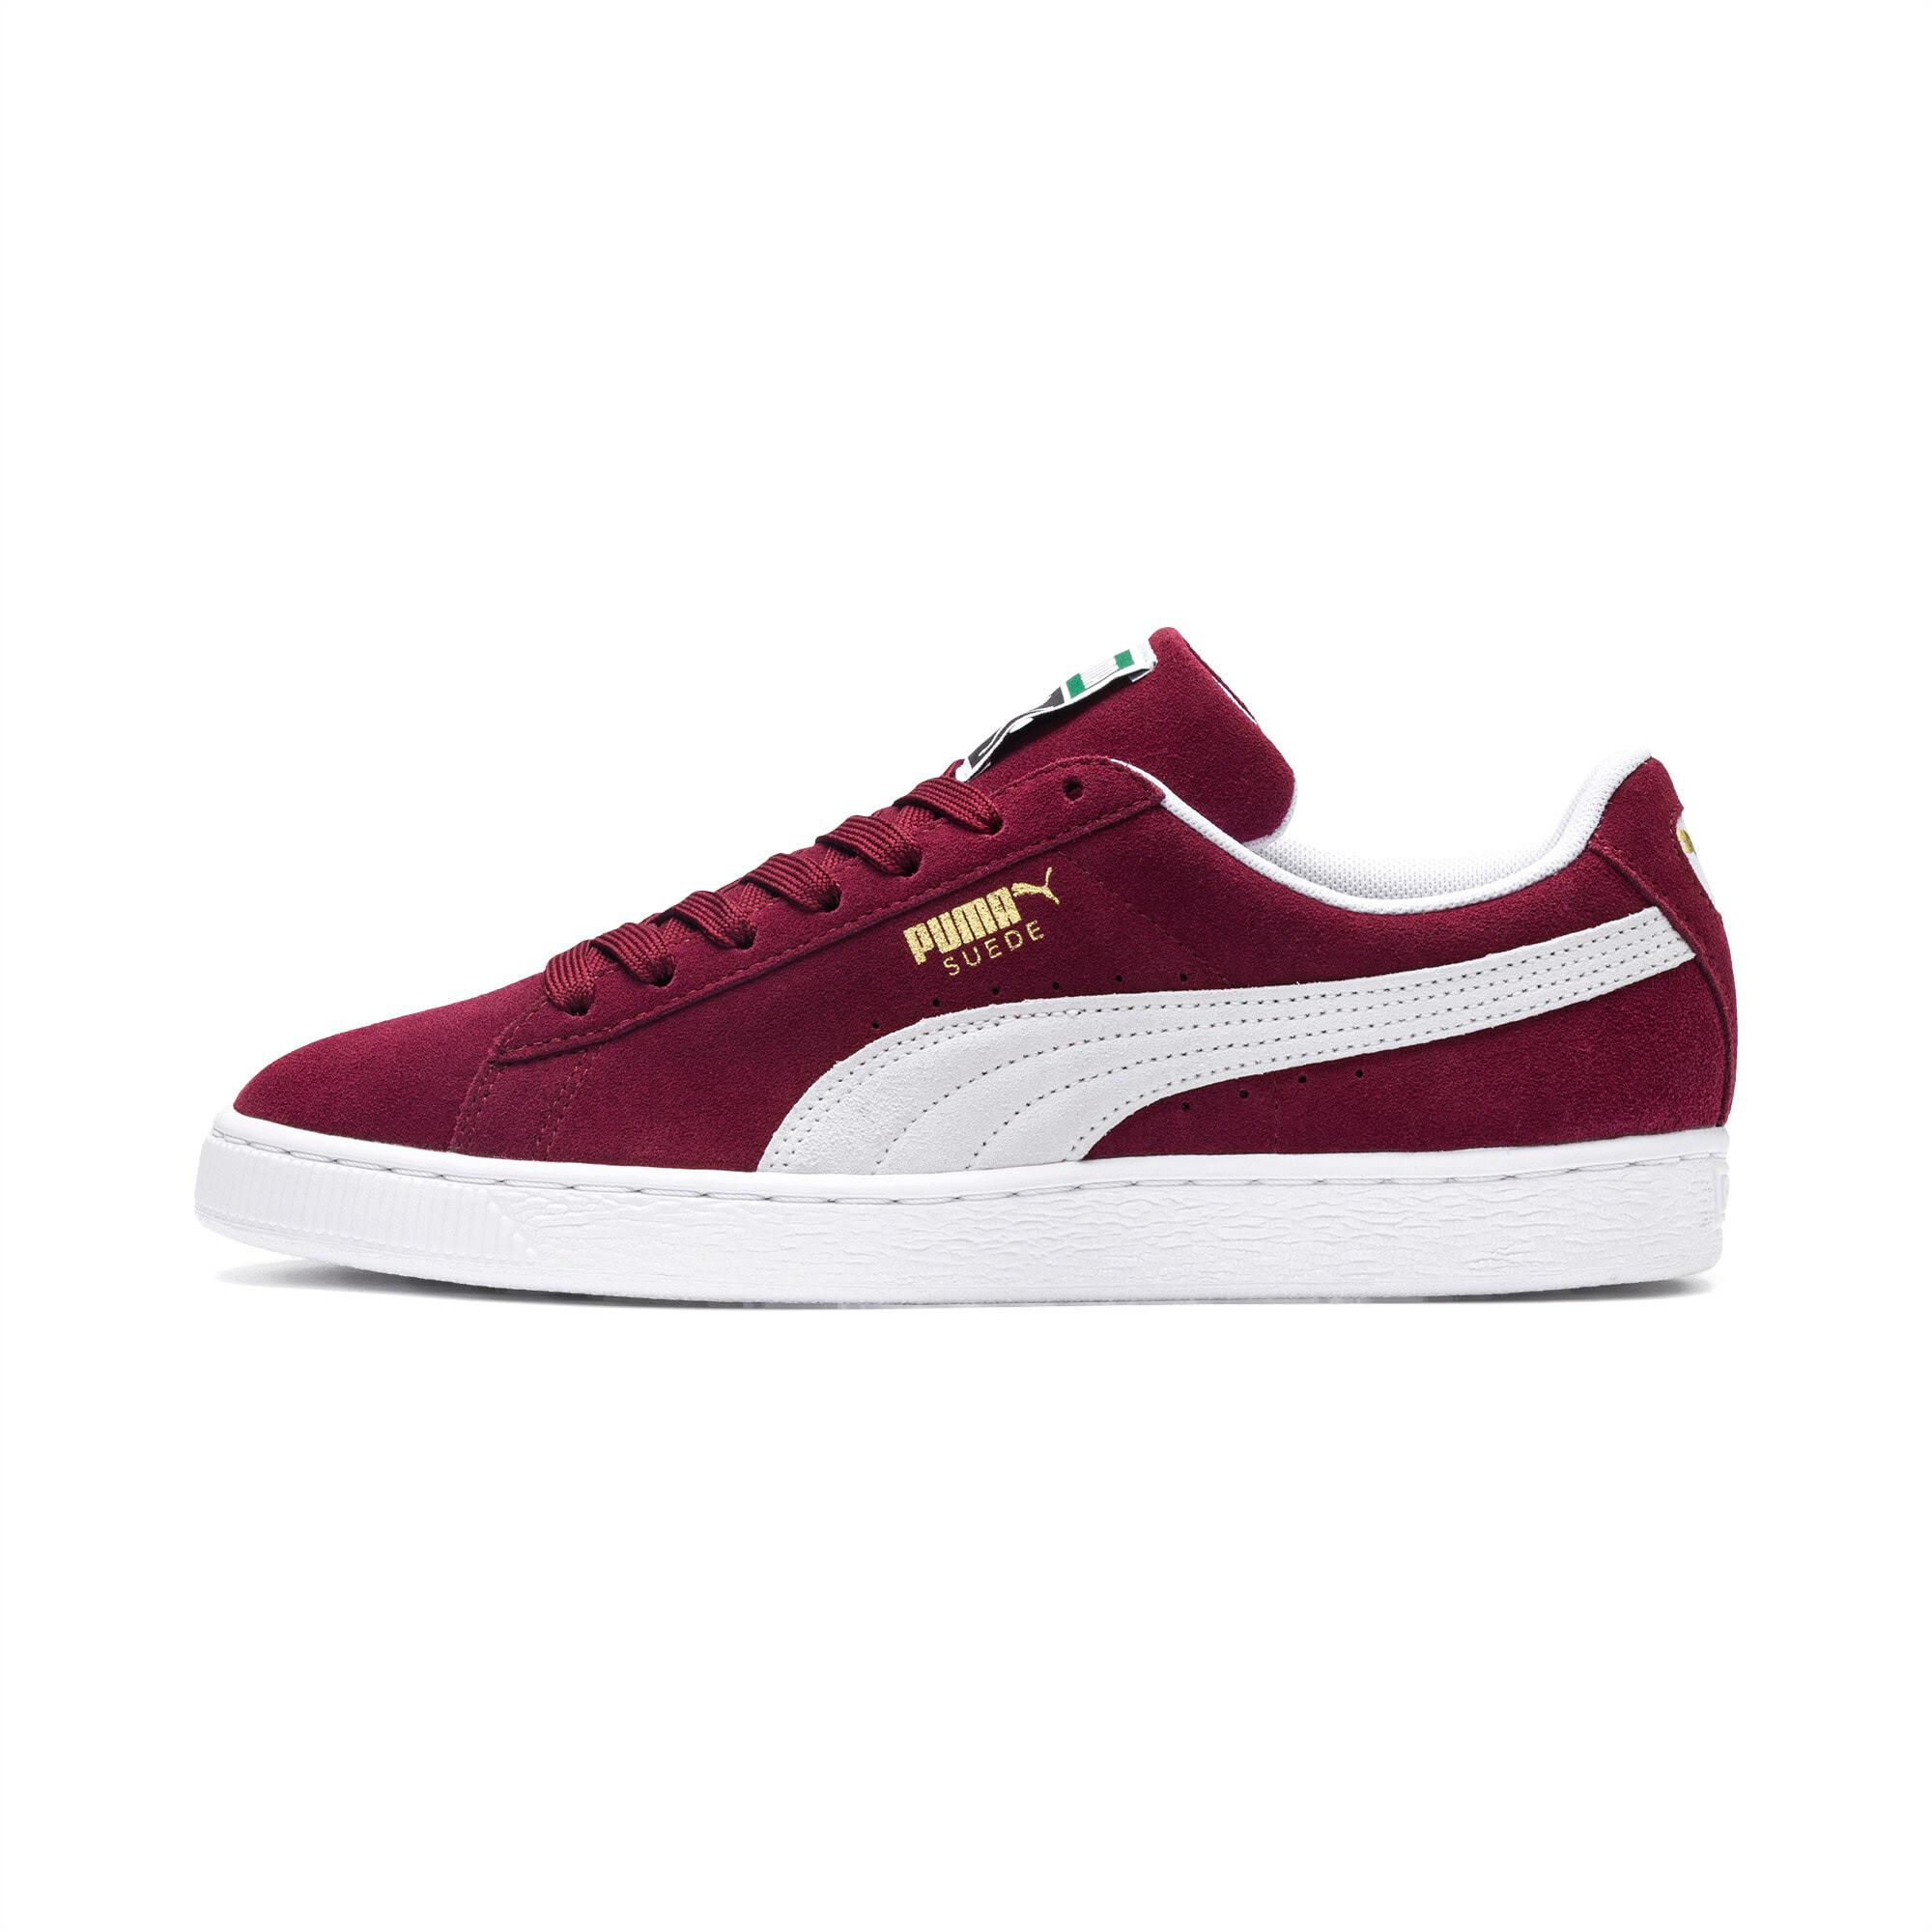 PUMA-Suede-Classic-Sneakers-Men-Shoe-Sport-Shoe thumbnail 19